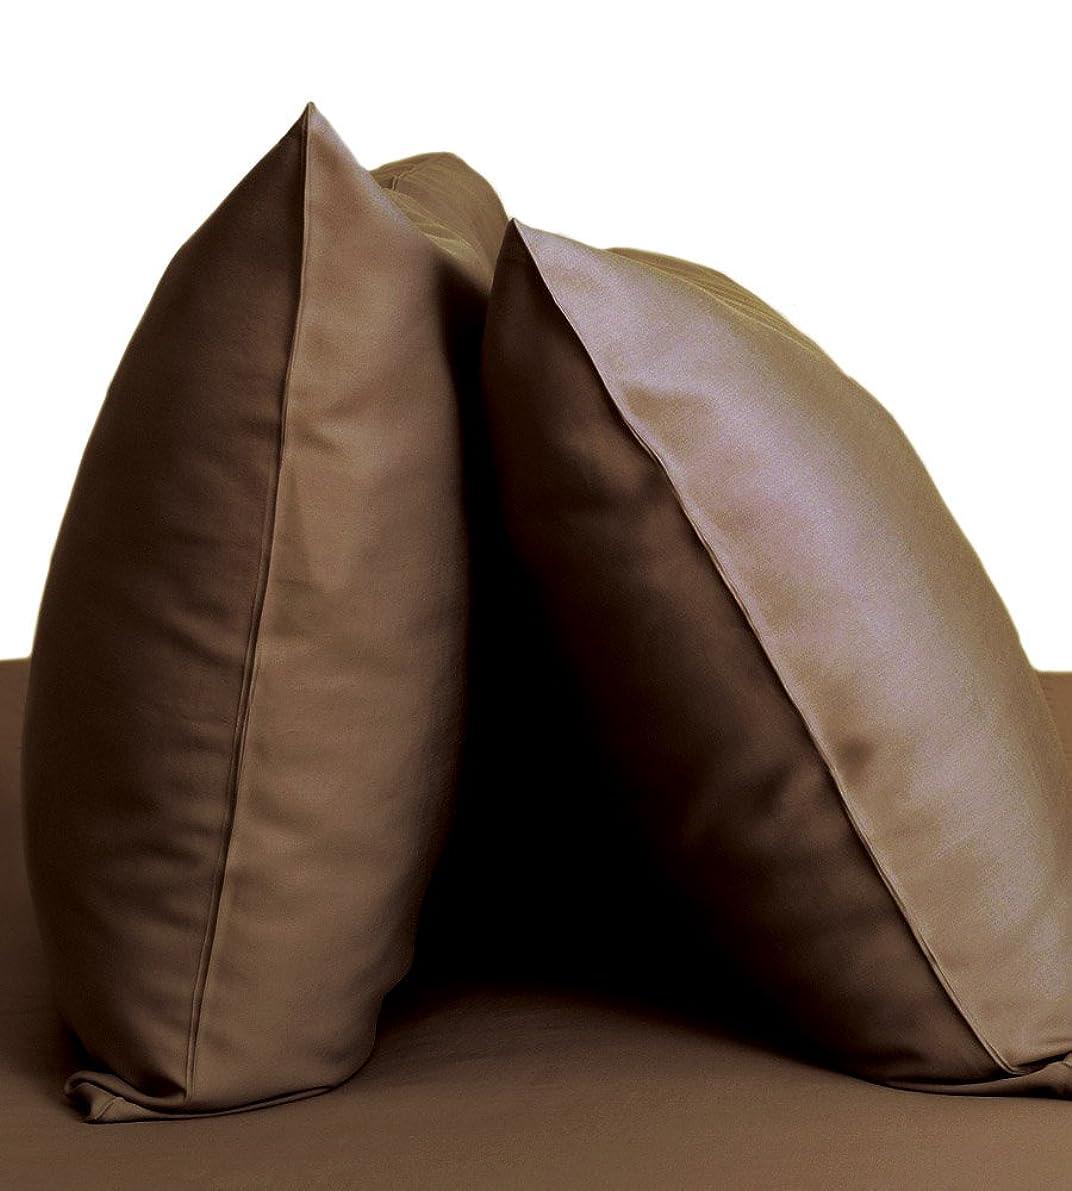 Cariloha Resort Bamboo Pillowcases 2 Piece Pillowcase Set - 100% Viscose from Bamboo Bedding (Standard, Almond Truffle)